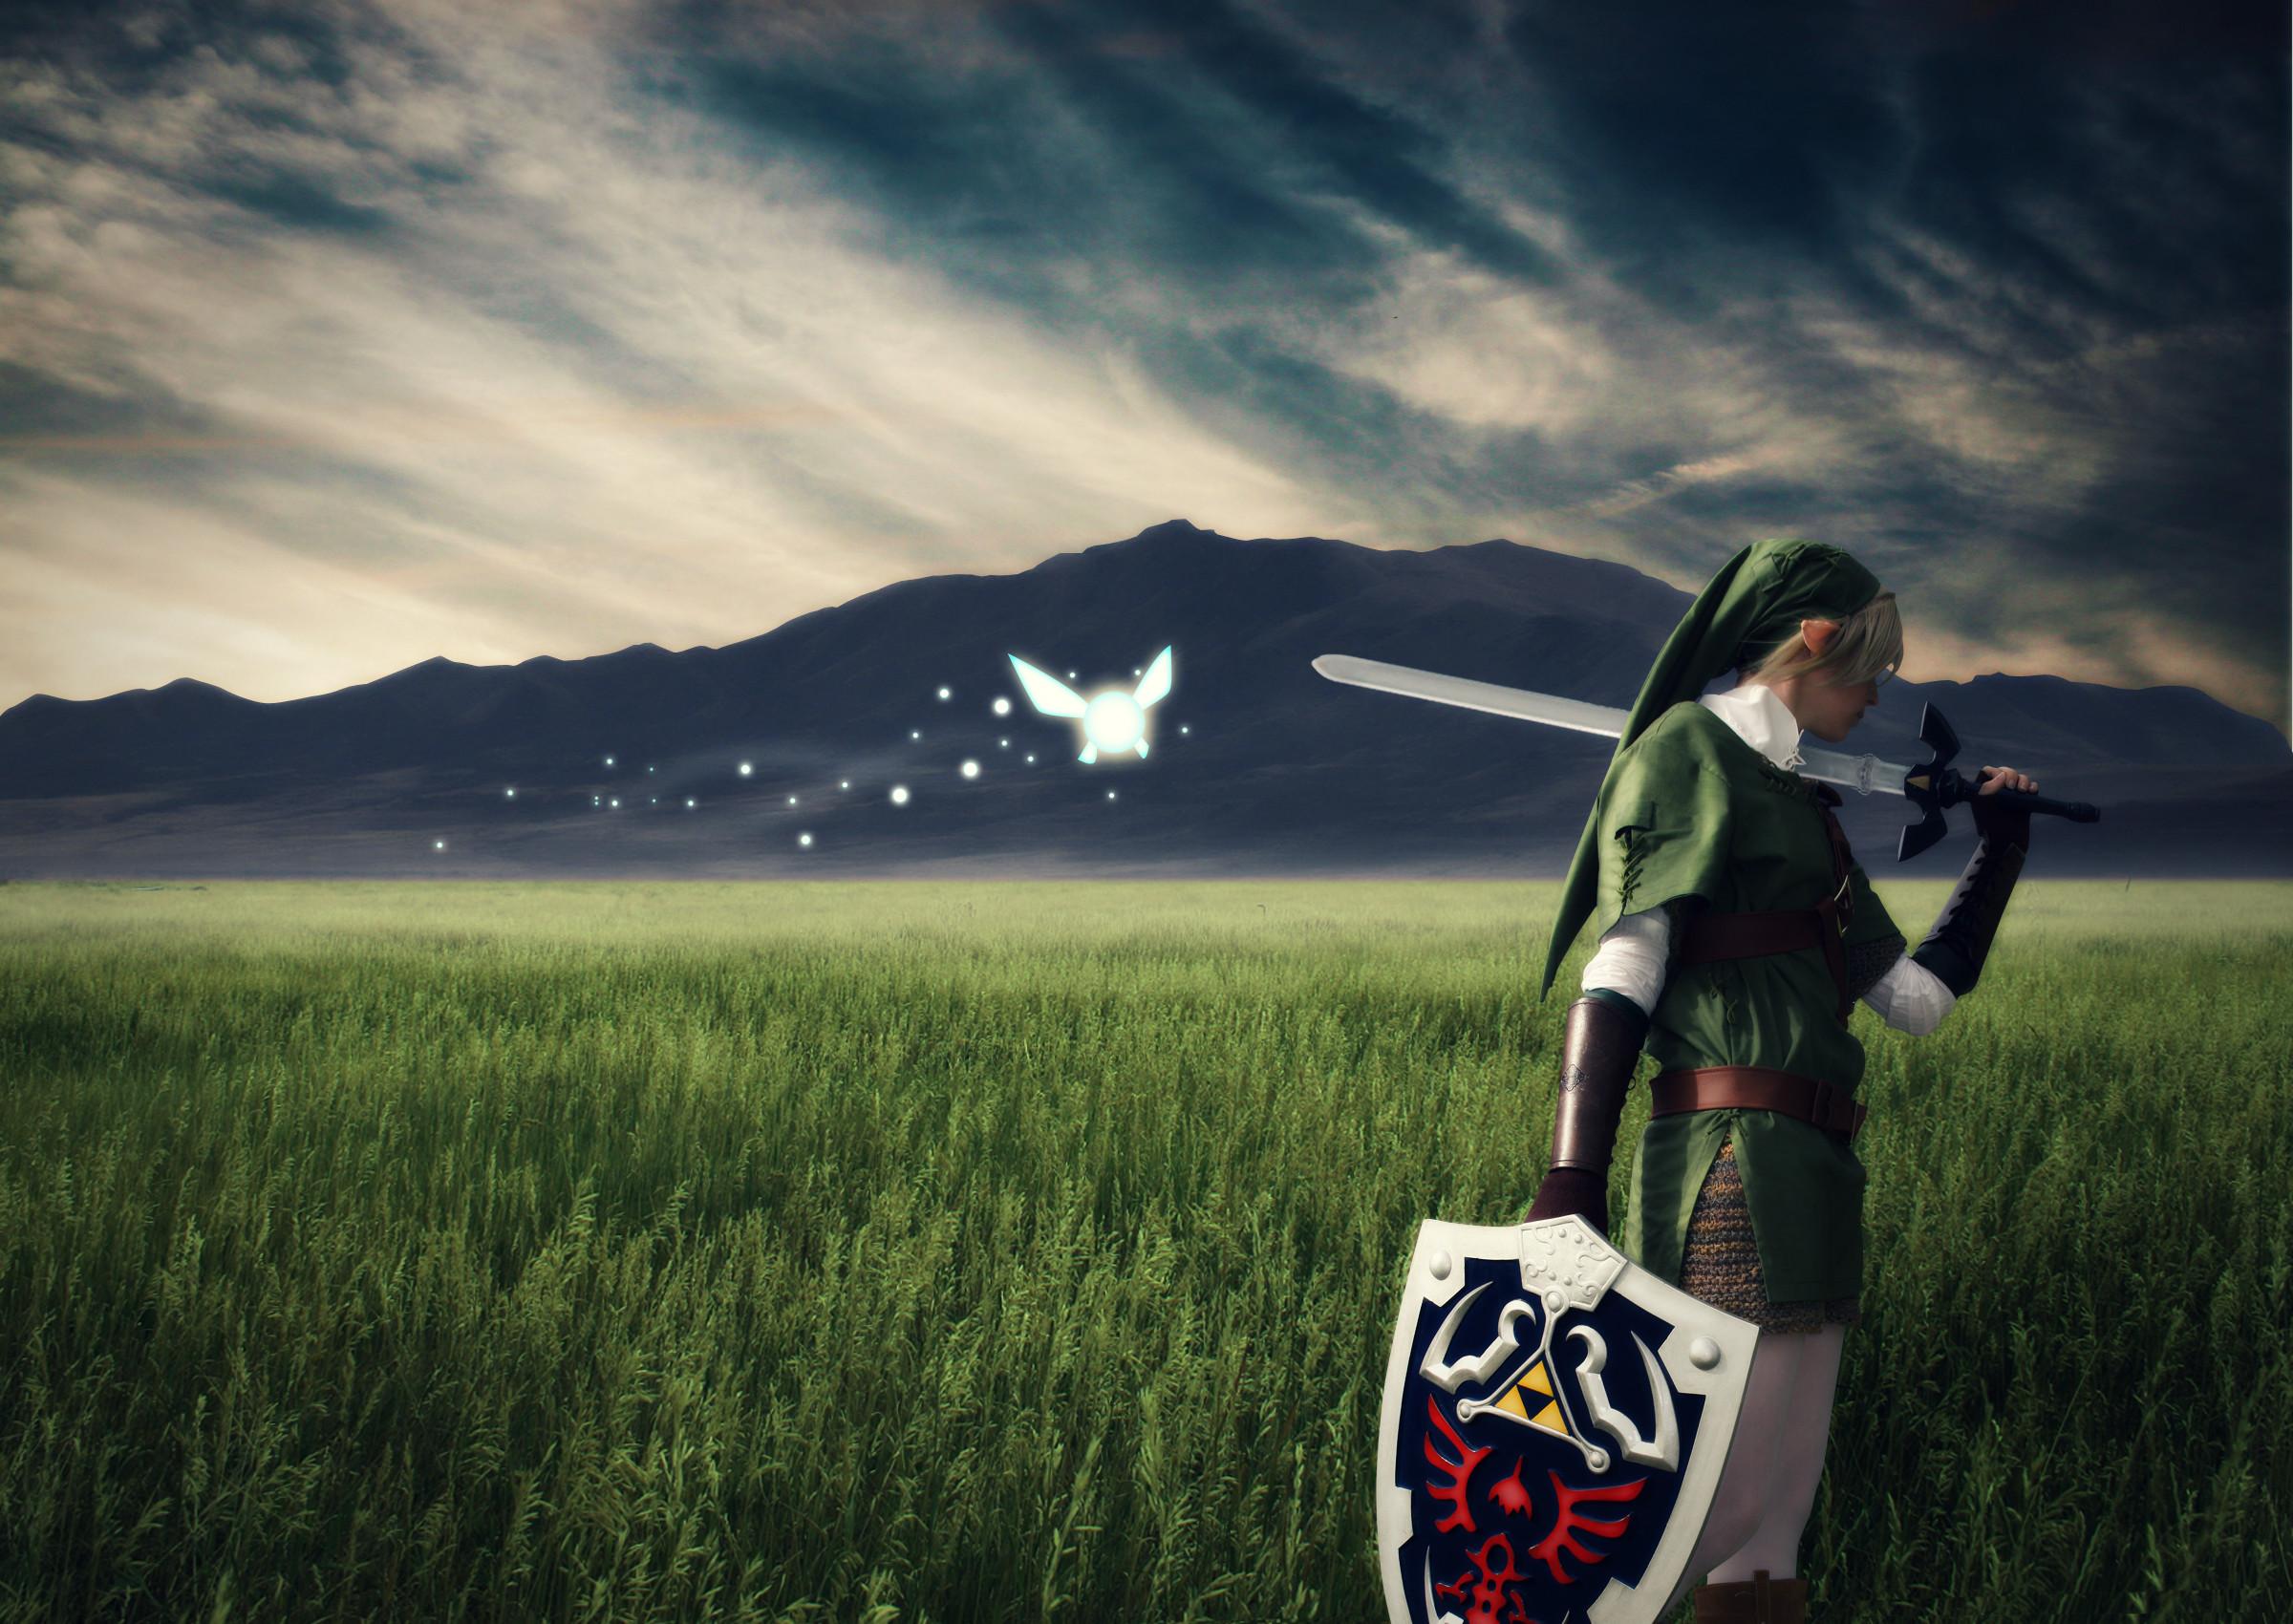 Legend-of-Zelda-Field-Background